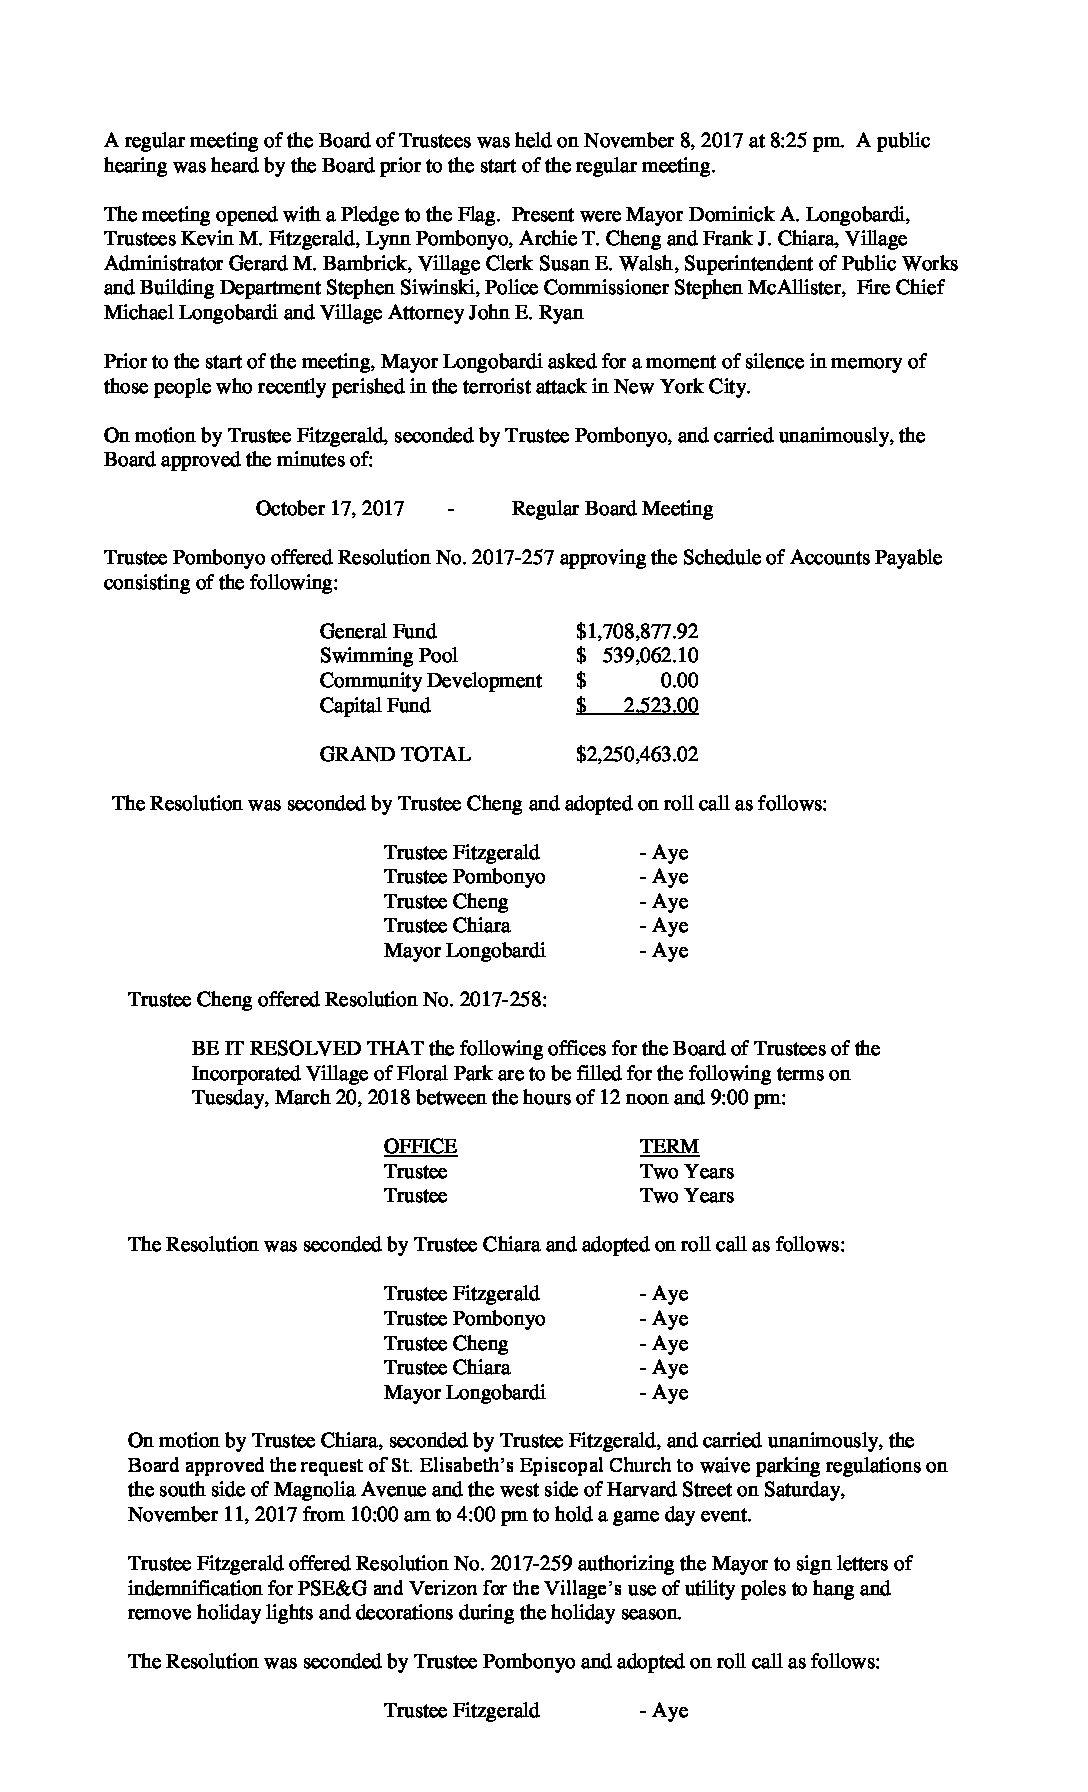 Minutes - 11-08-2017 Board of Trustees Meeting